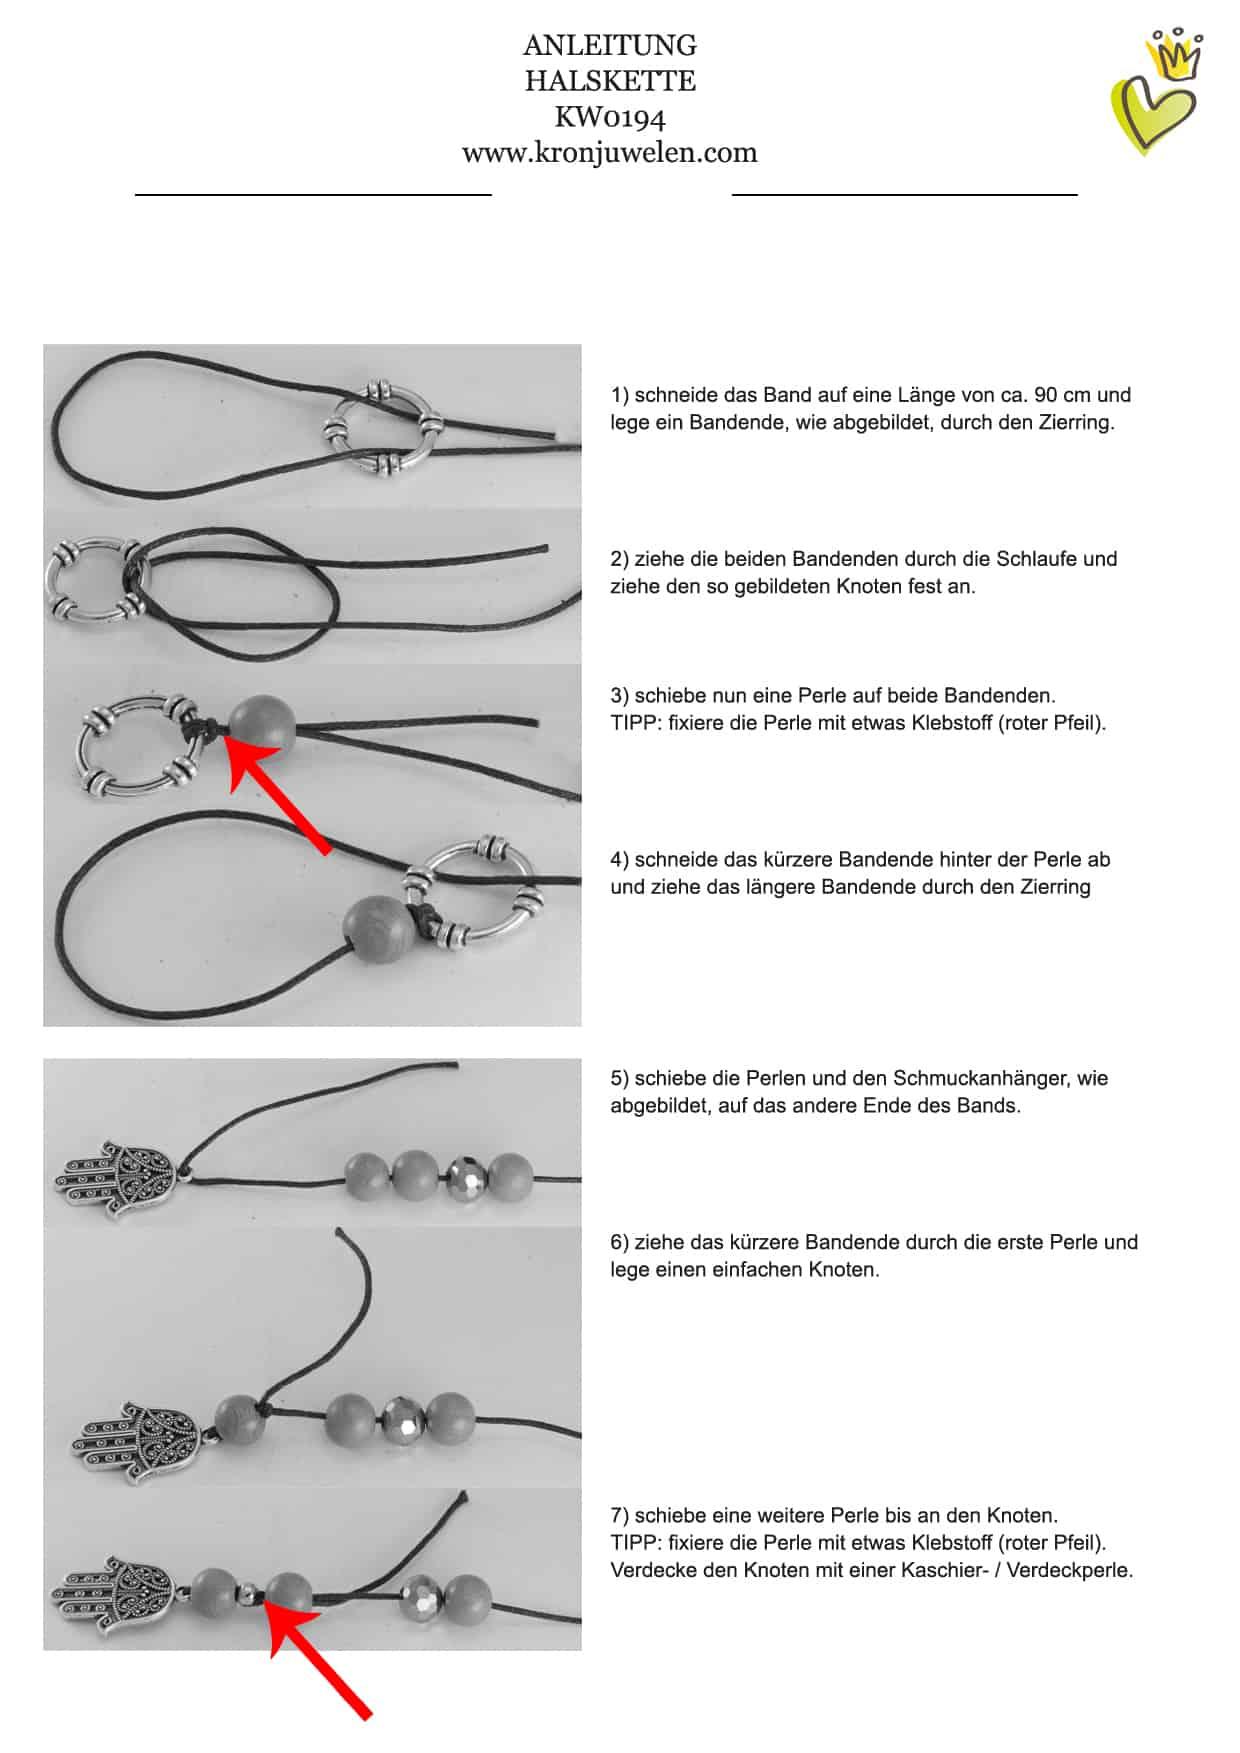 Buddha Halskette Anleitung